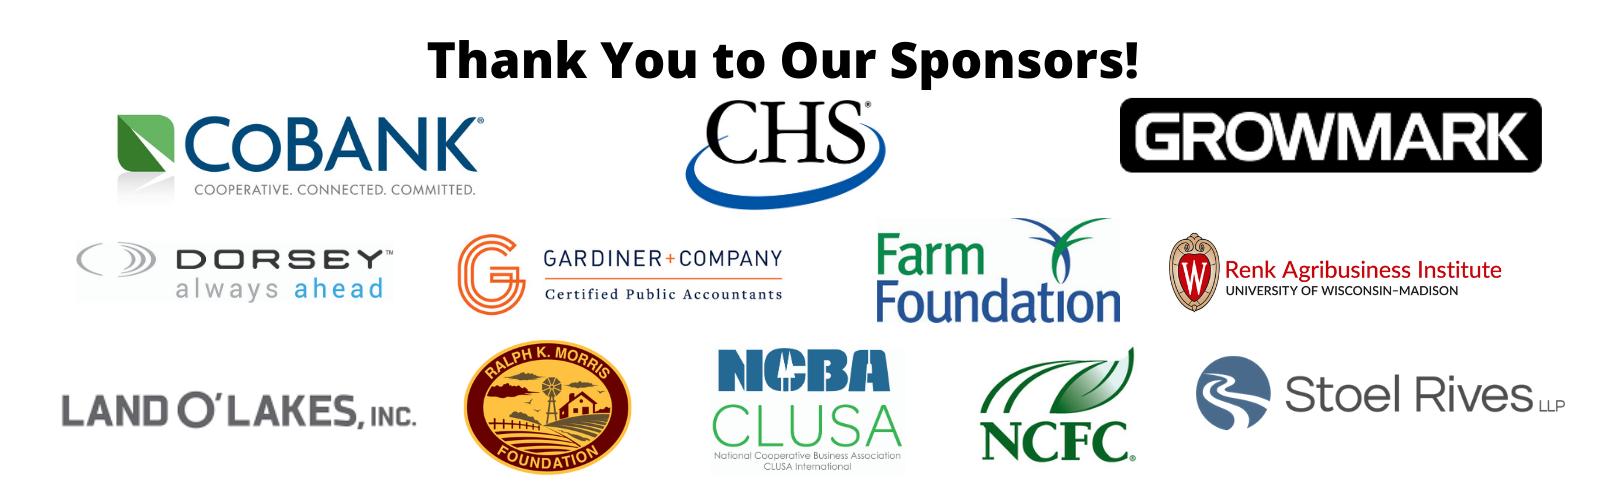 FCC sponsor logos